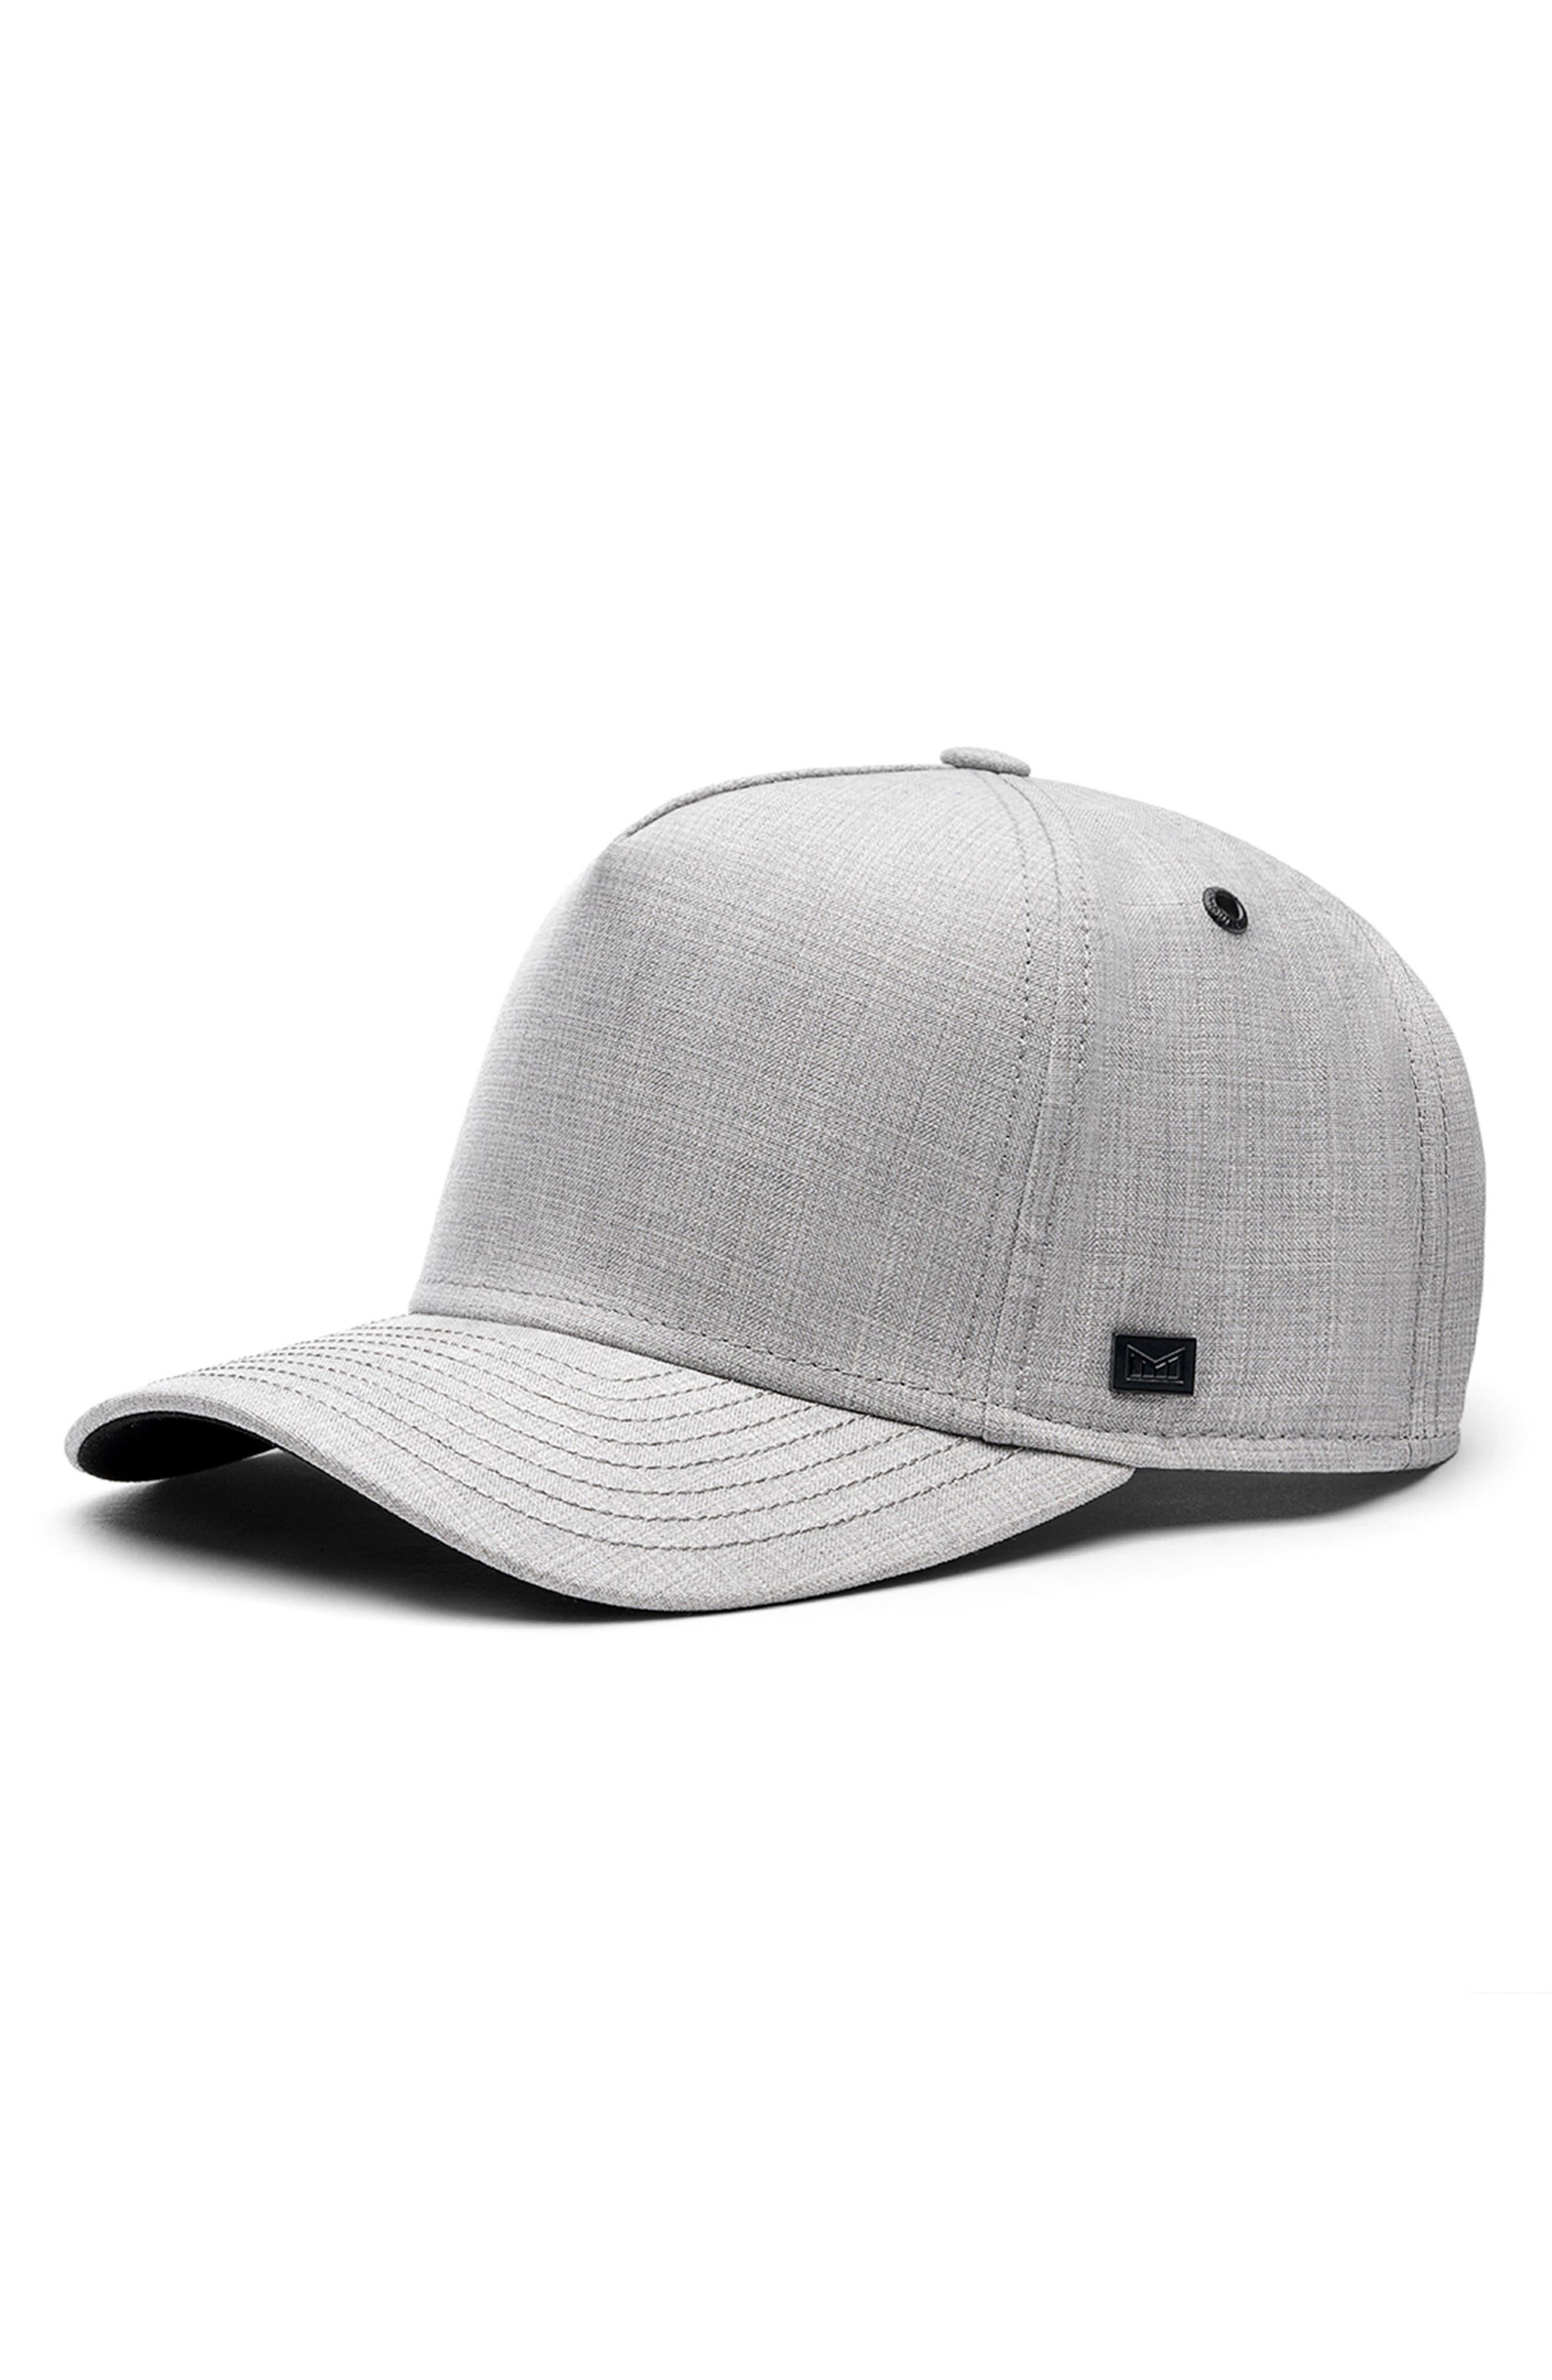 Odyssey Baseball Cap,                         Main,                         color, Light Grey